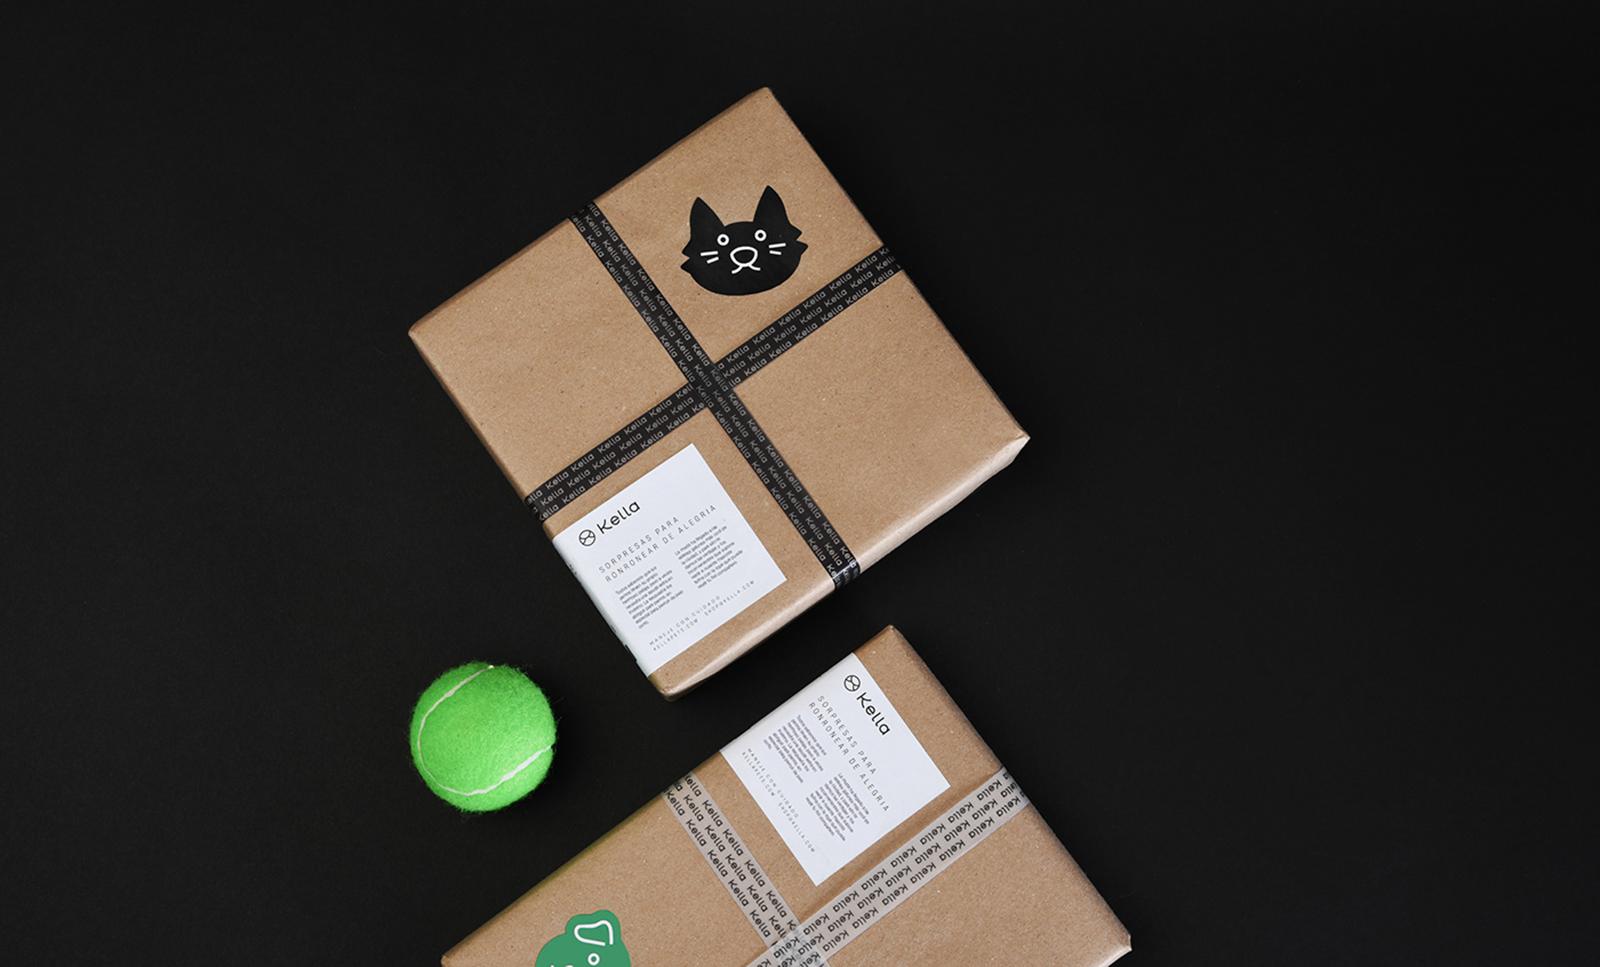 Kella宠物食品品牌视觉VI形象设计欣赏-深圳VI设计2